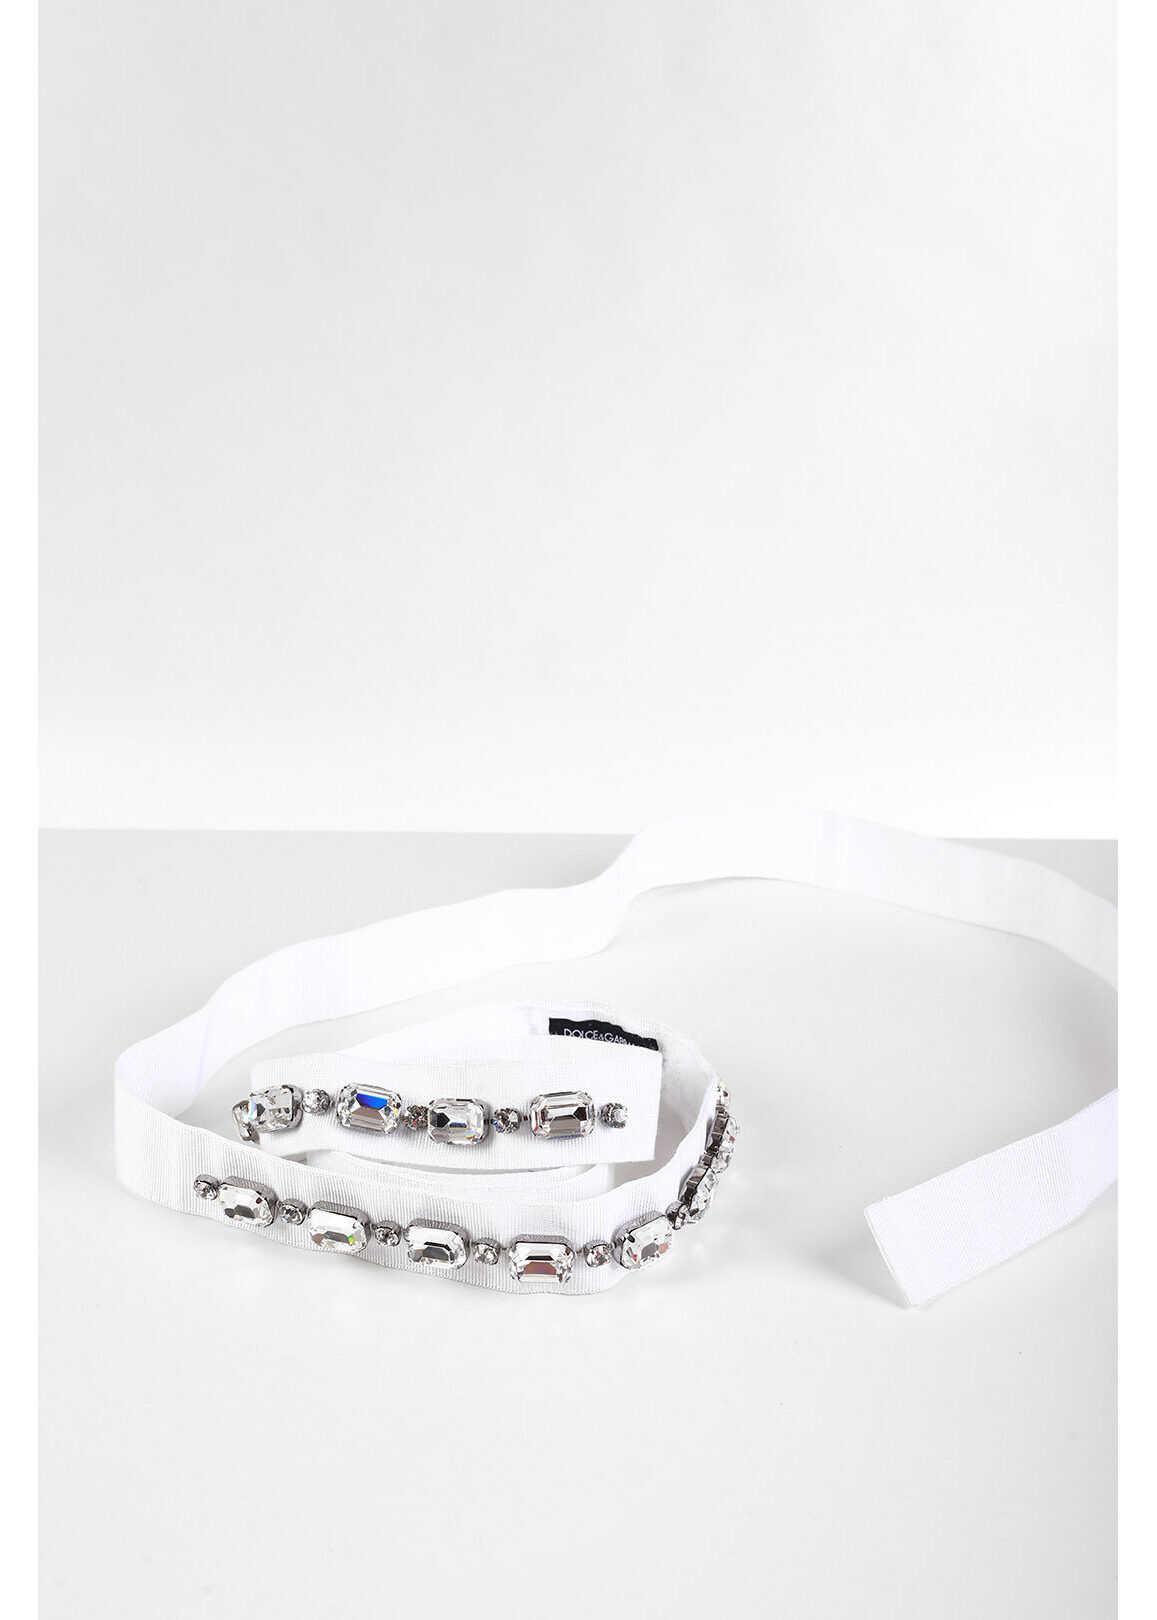 Dolce & Gabbana Belt with Crystals 30mm WHITE